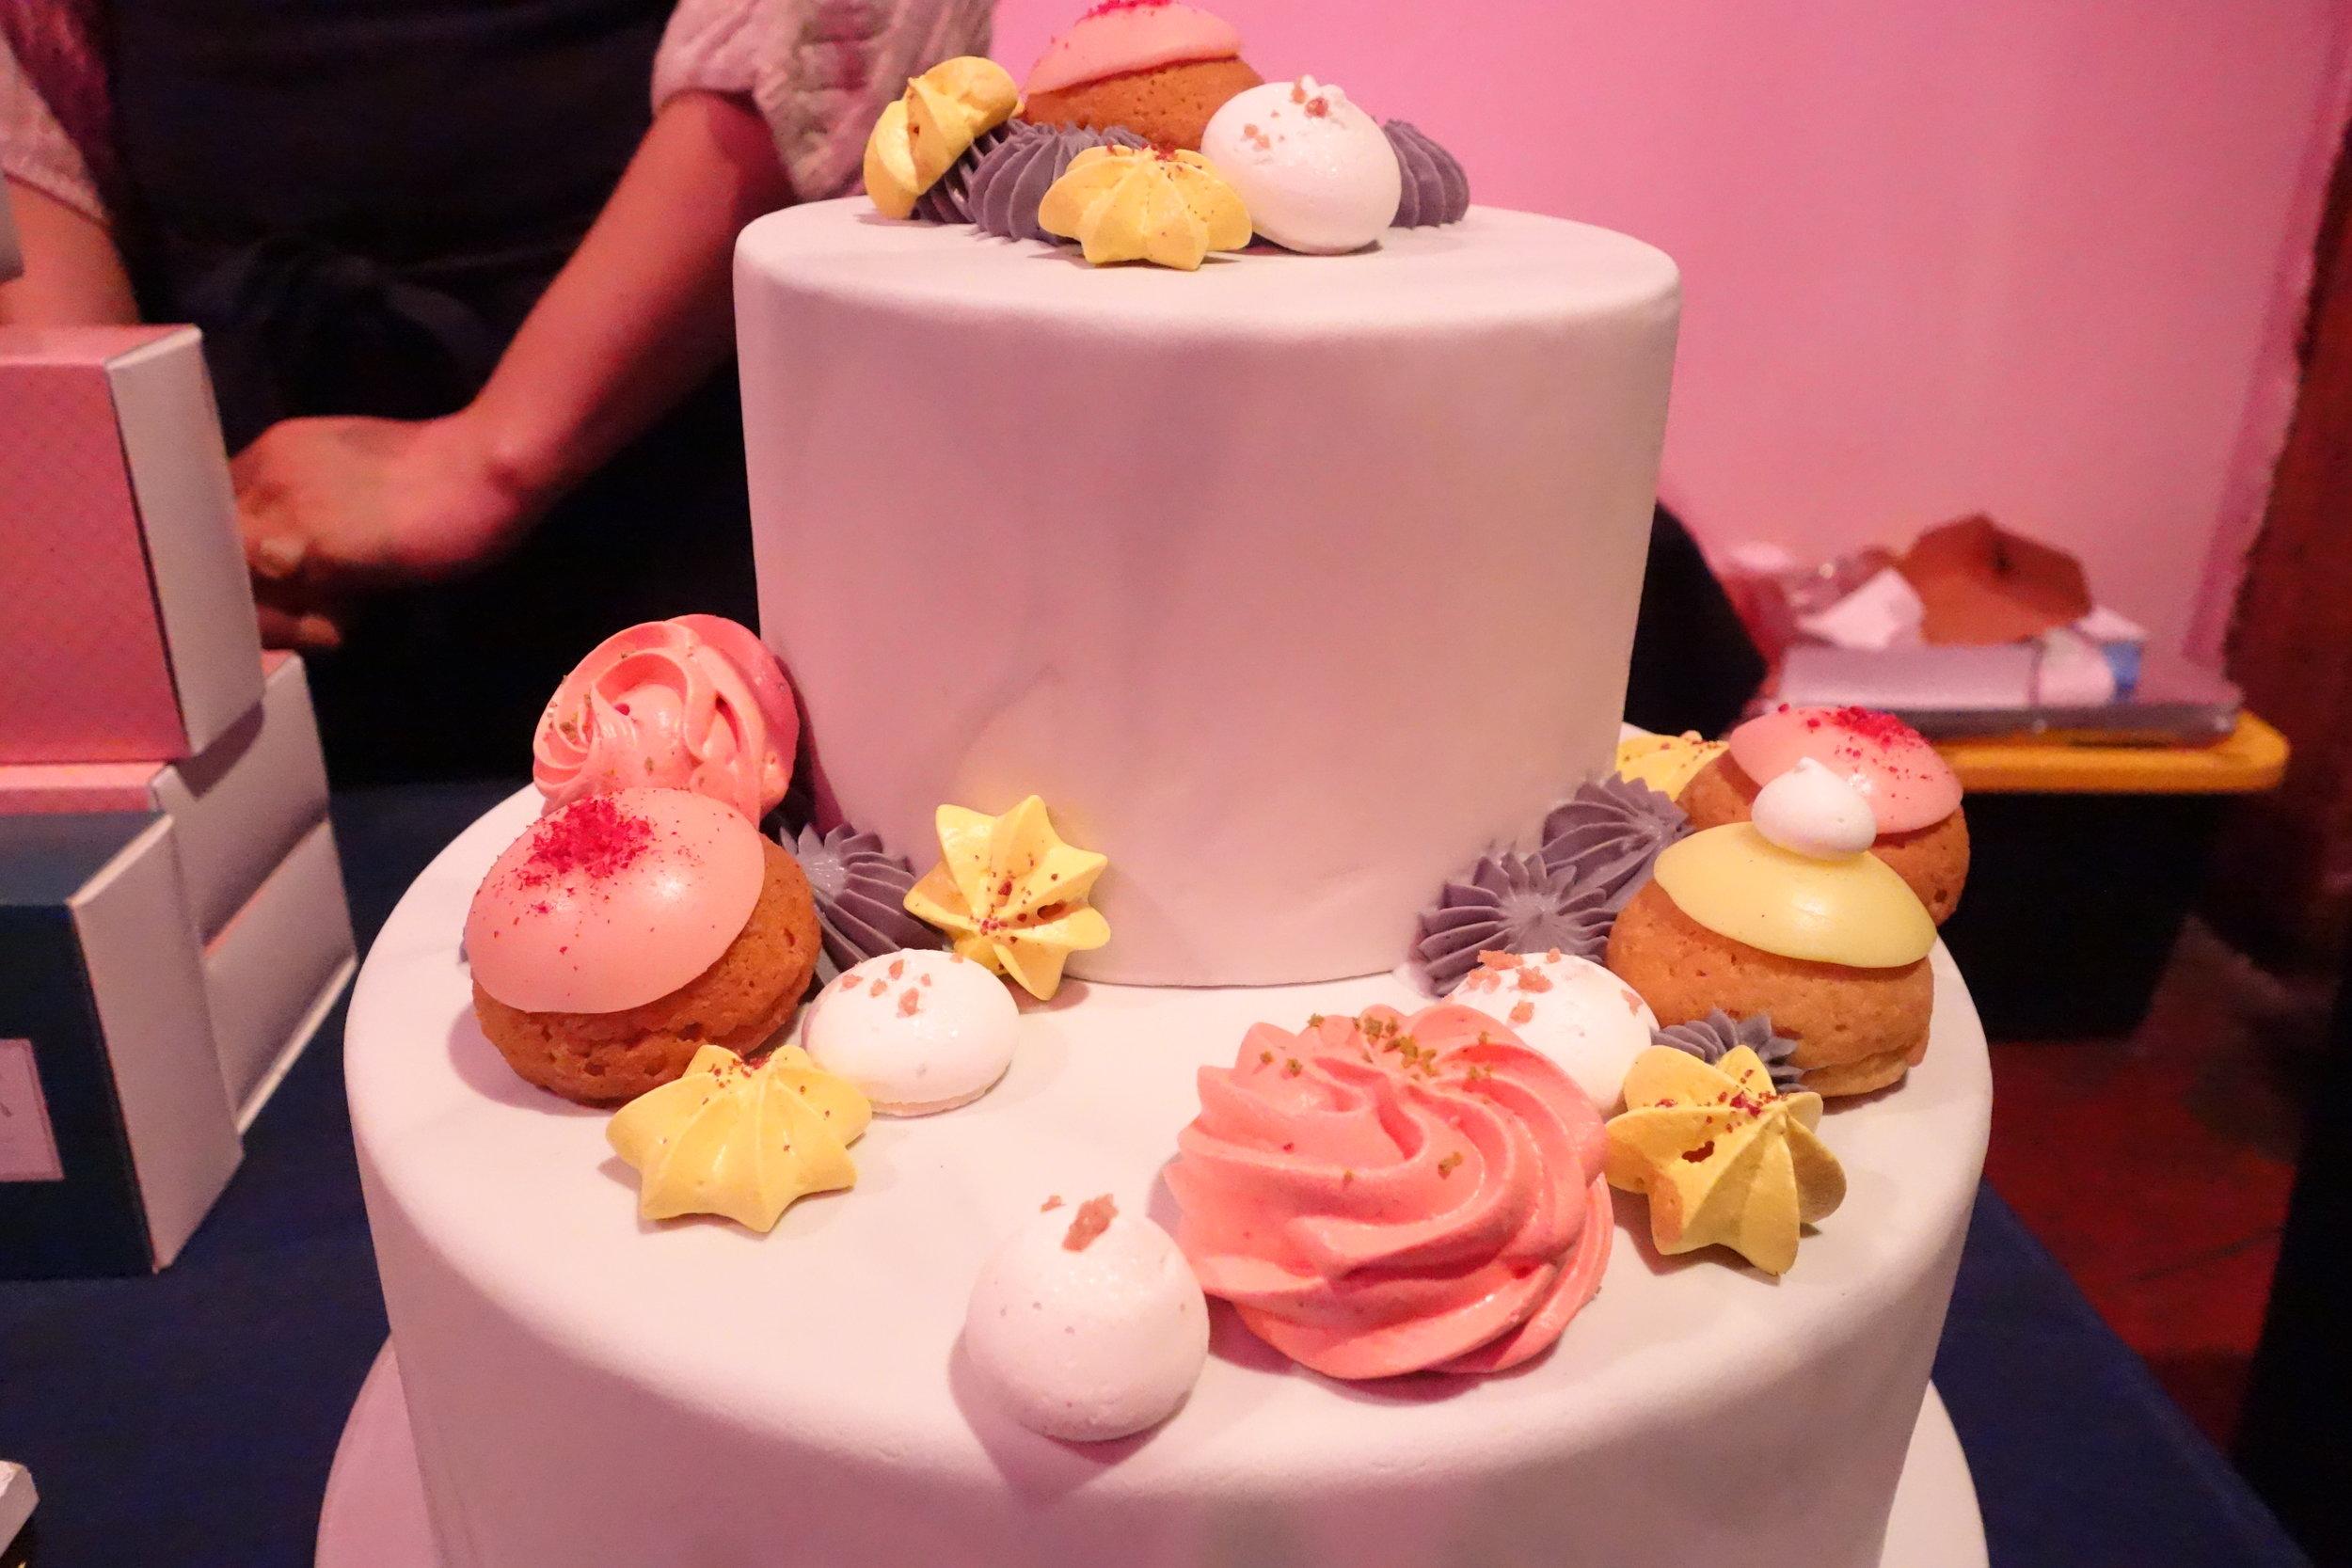 Assorted Desserts by Choux